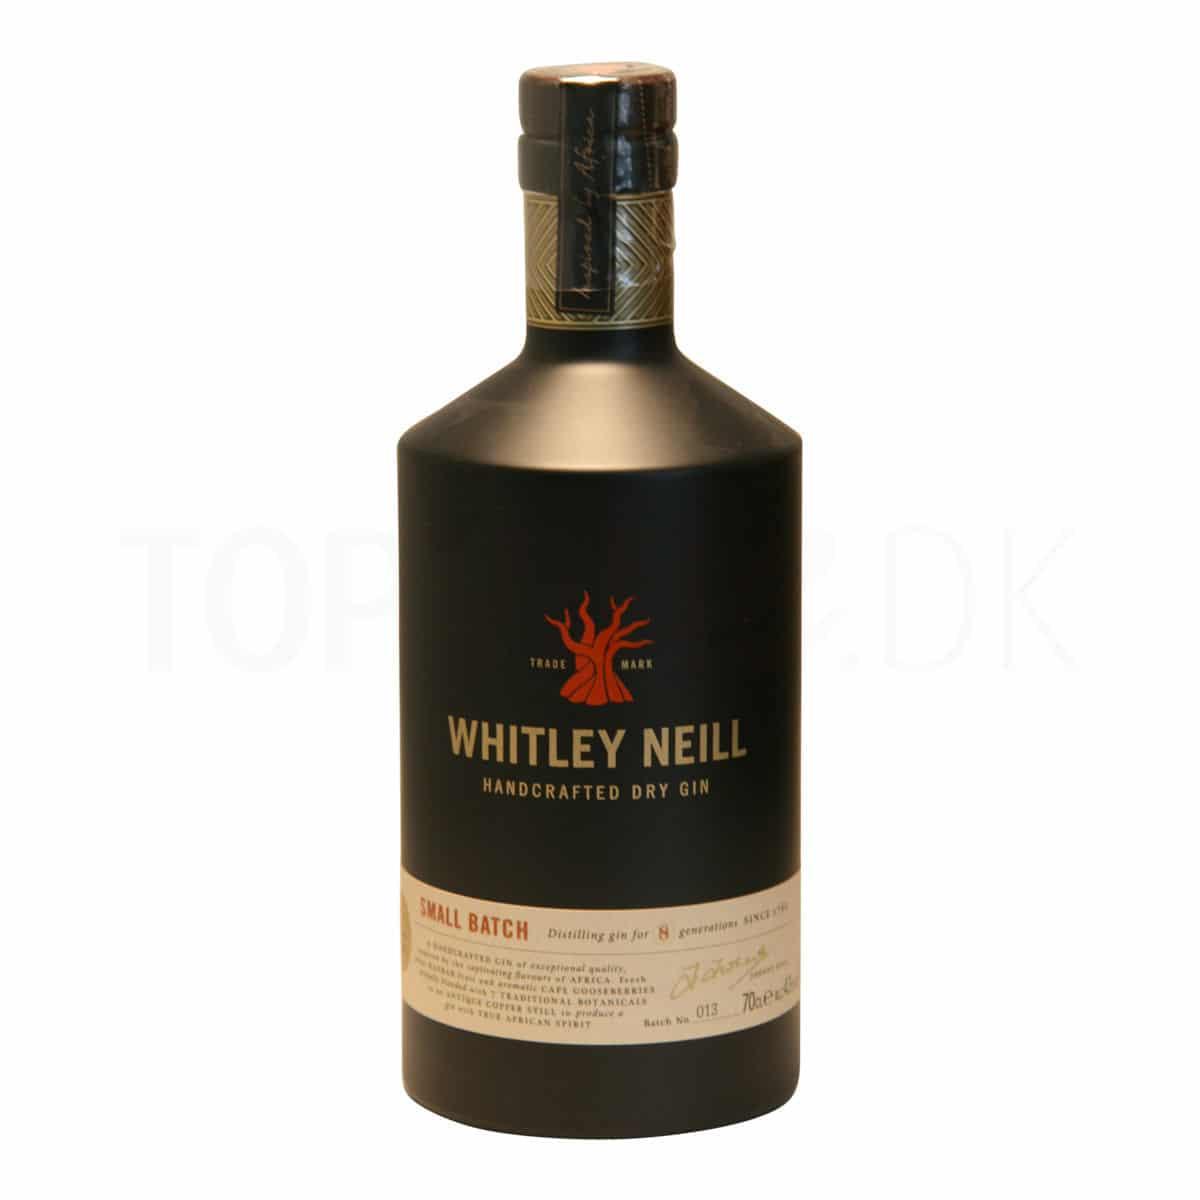 Topvine Whitley Neill small batch